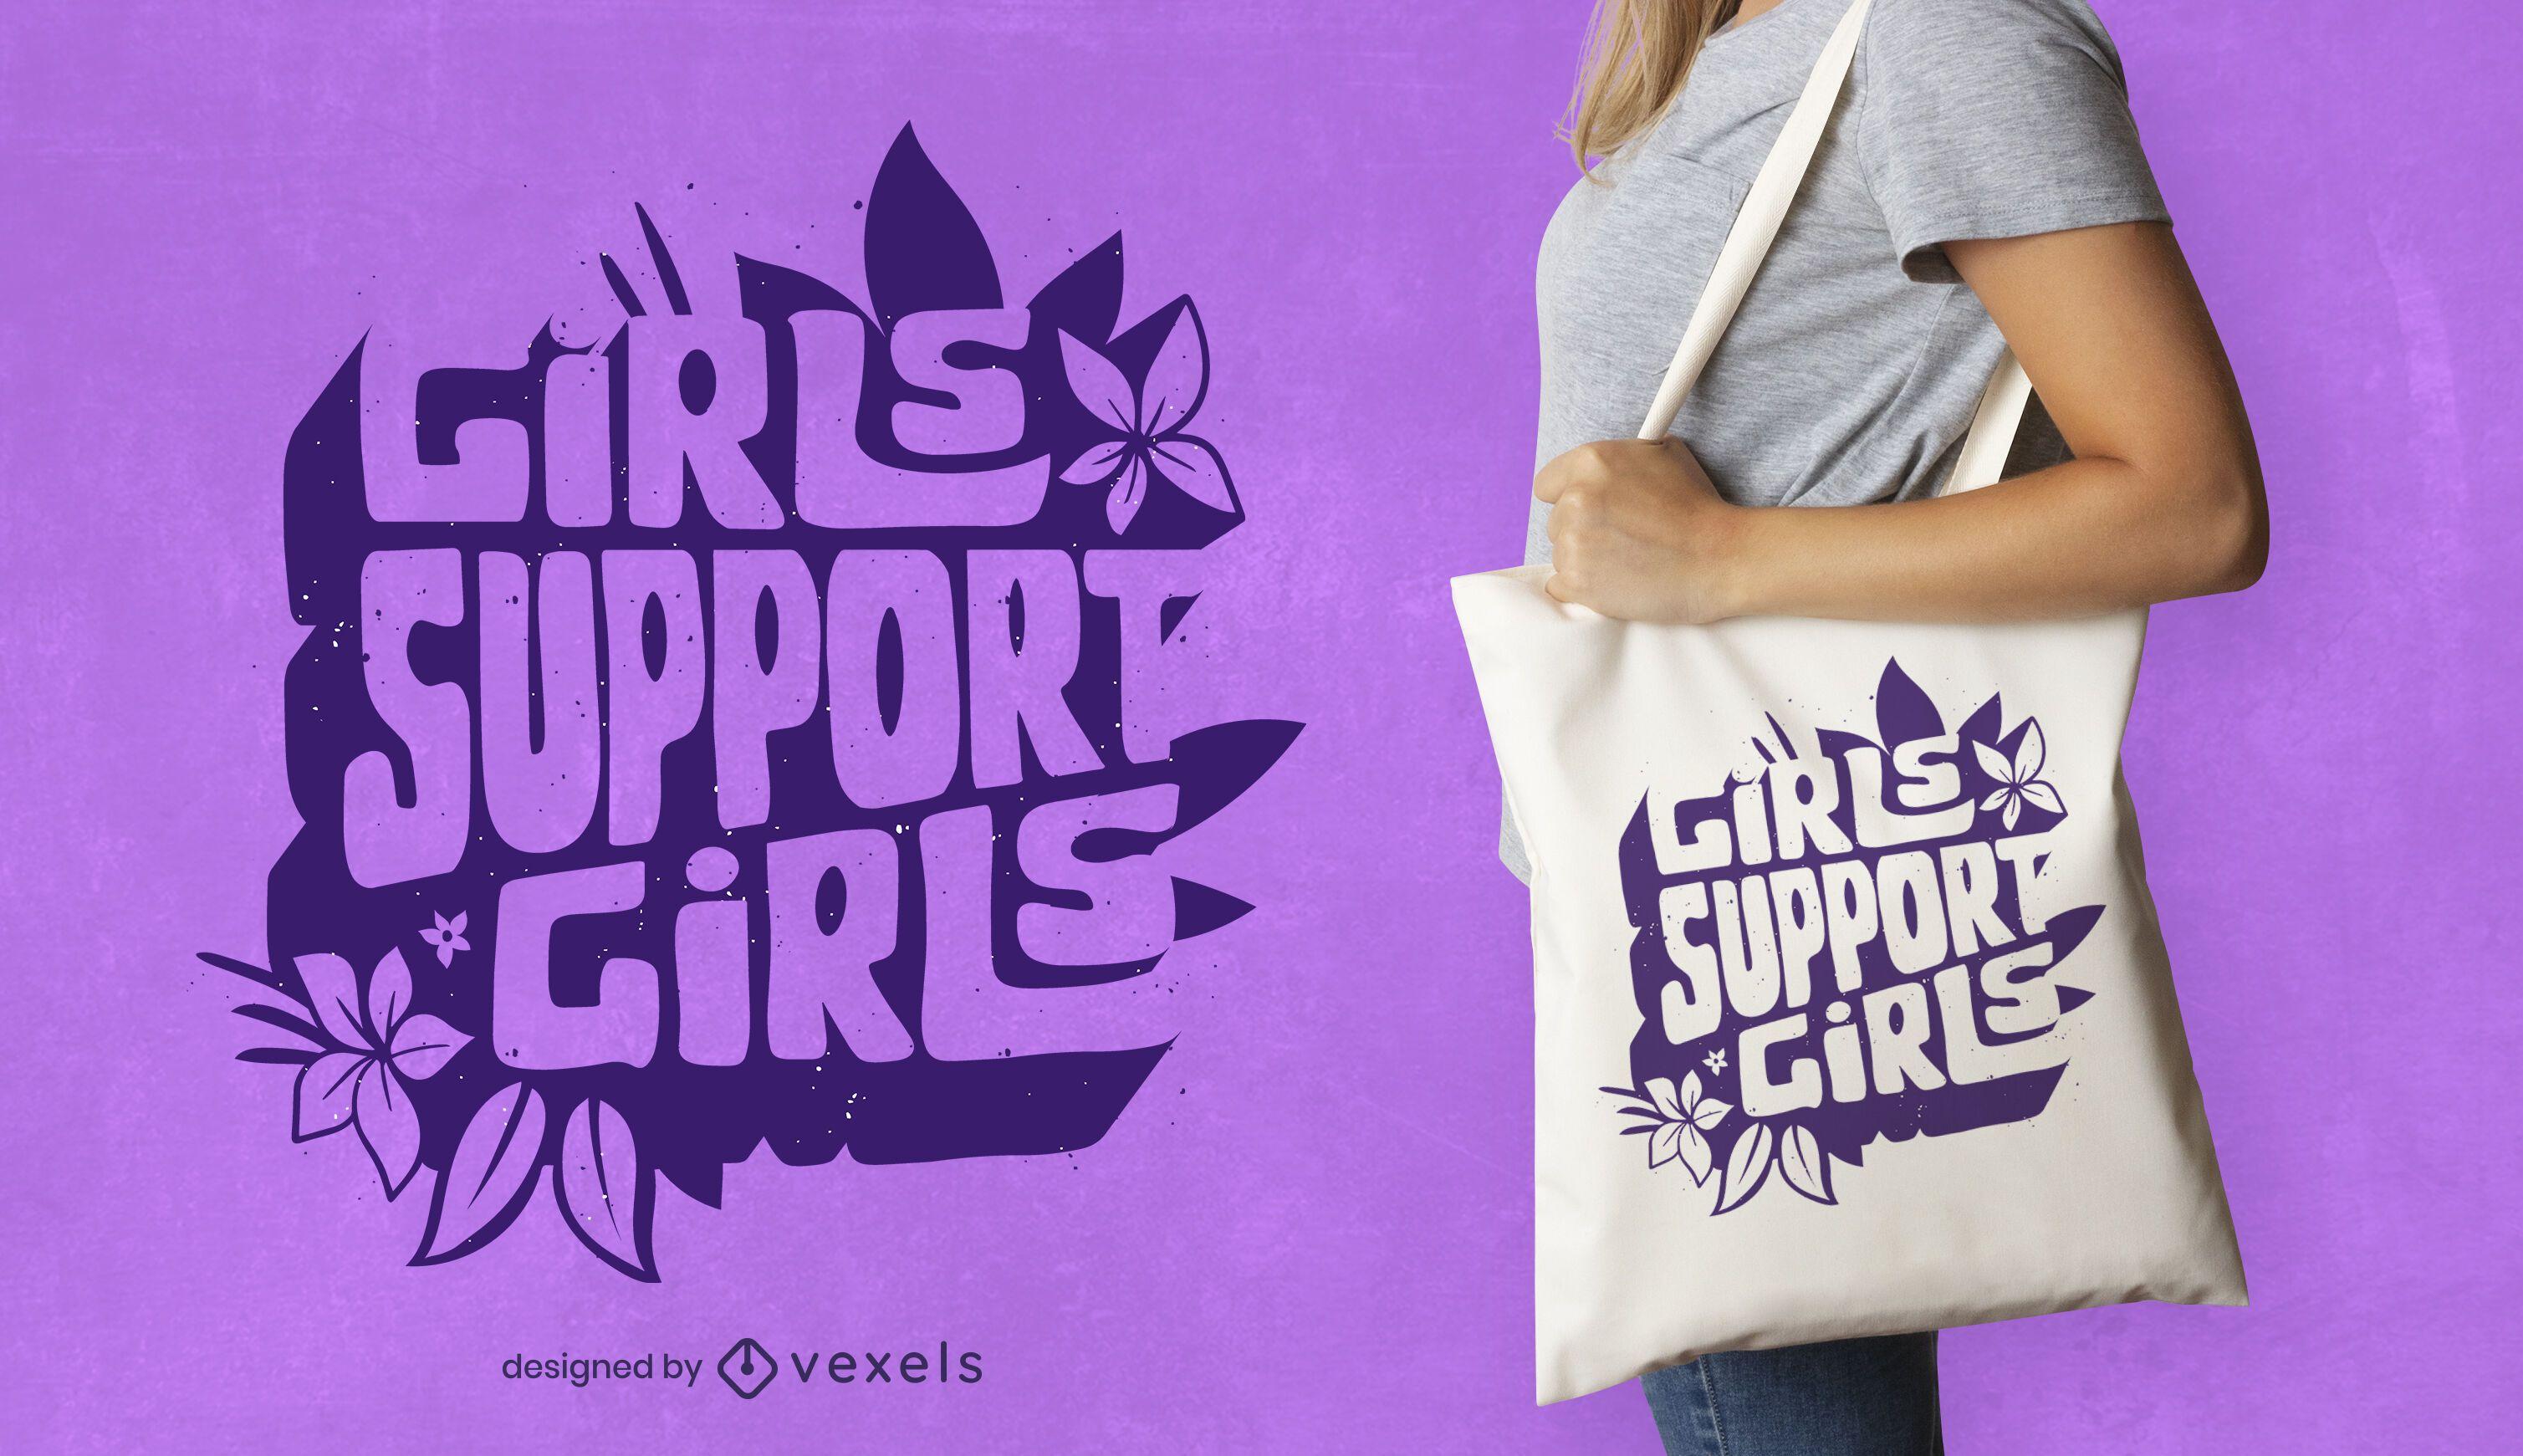 Las niñas apoyan el diseño de la bolsa de asas para niñas.